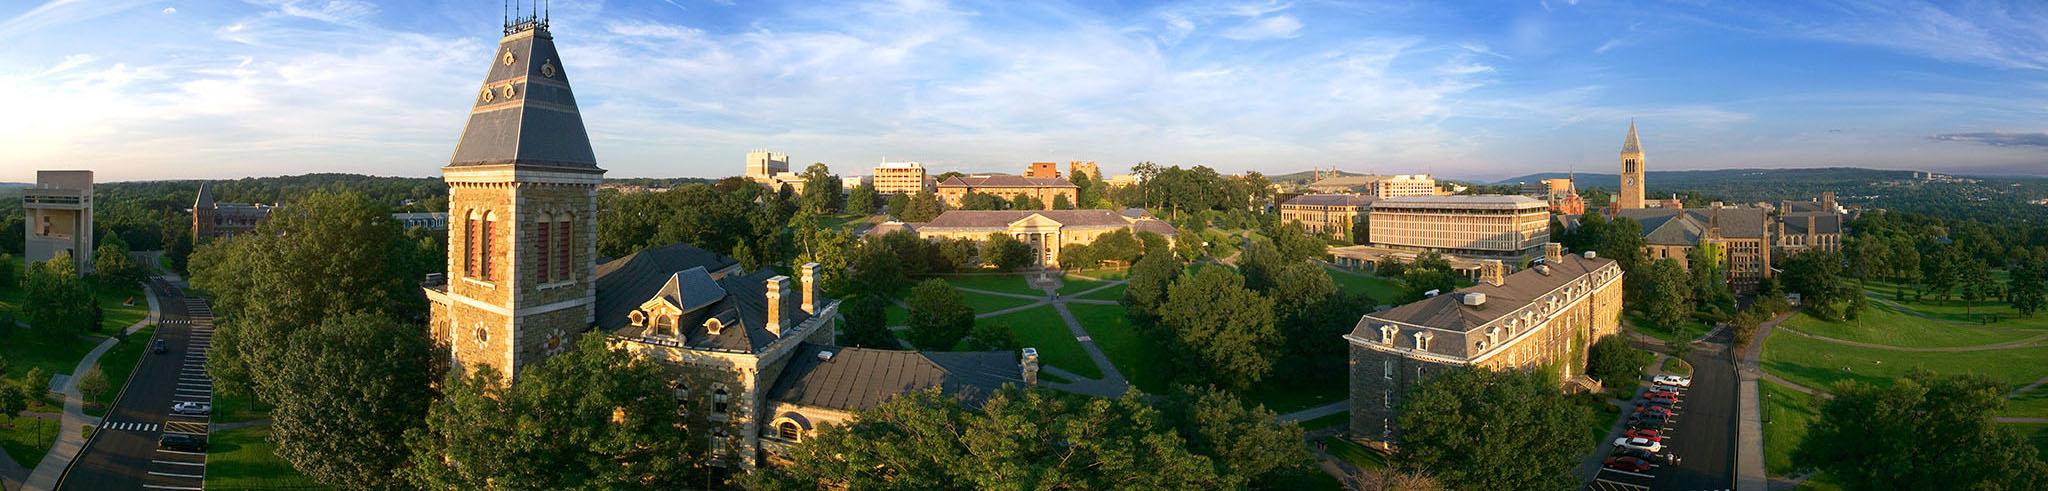 Cornell Academic Calendar 2021-2022 Academic Calendar 2020 2021 | Cornell University Registrar